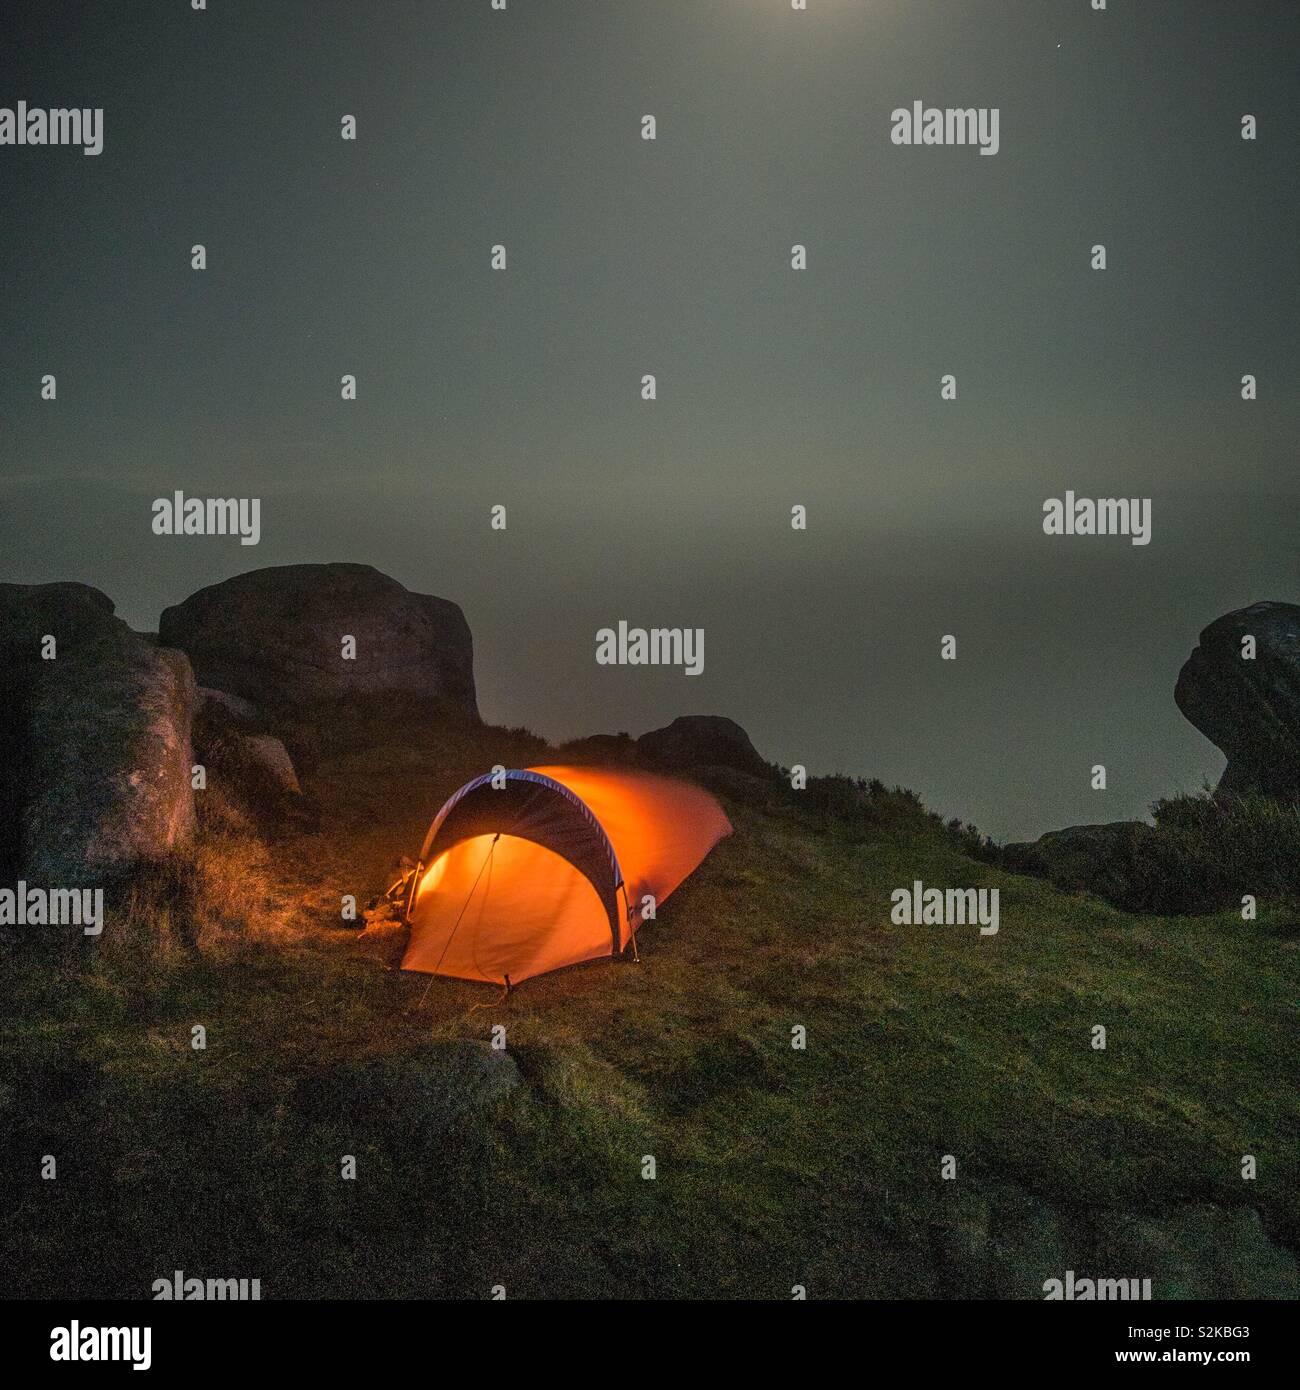 Wild camping - Stock Image